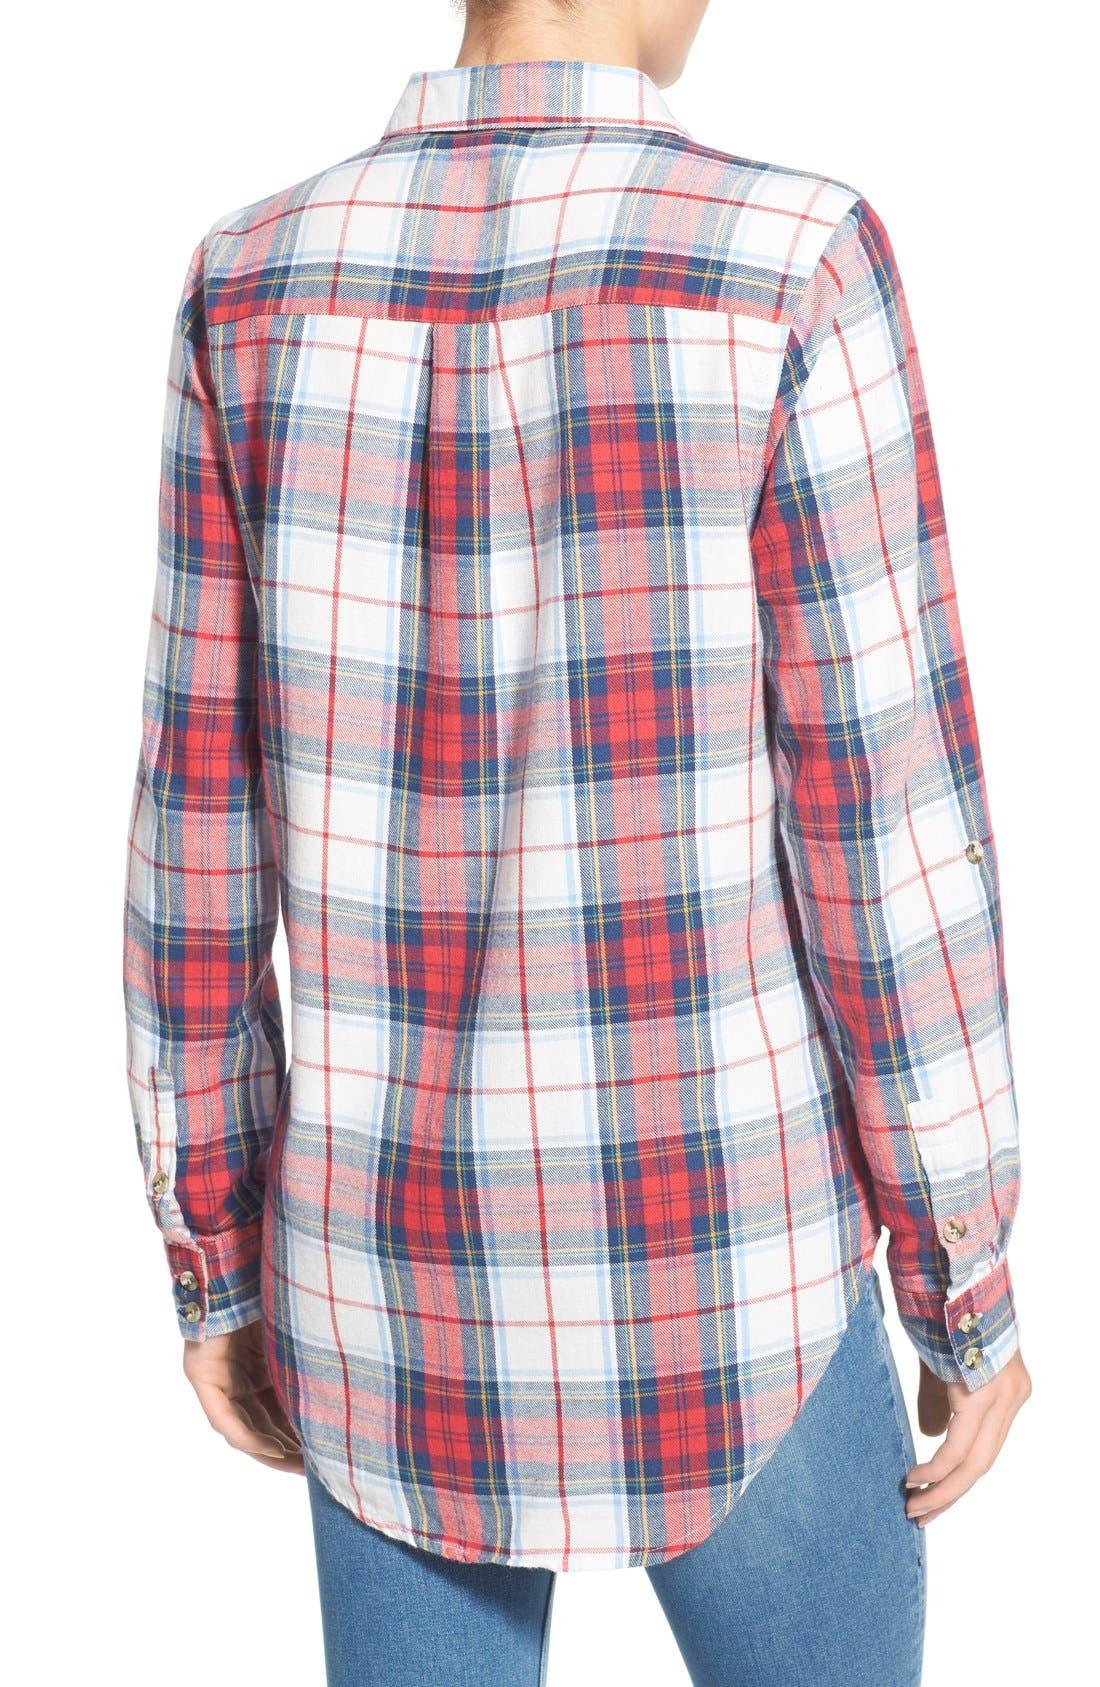 THREAD & SUPPLY,                             'Humboldt' Plaid Shirt,                             Alternate thumbnail 3, color,                             600